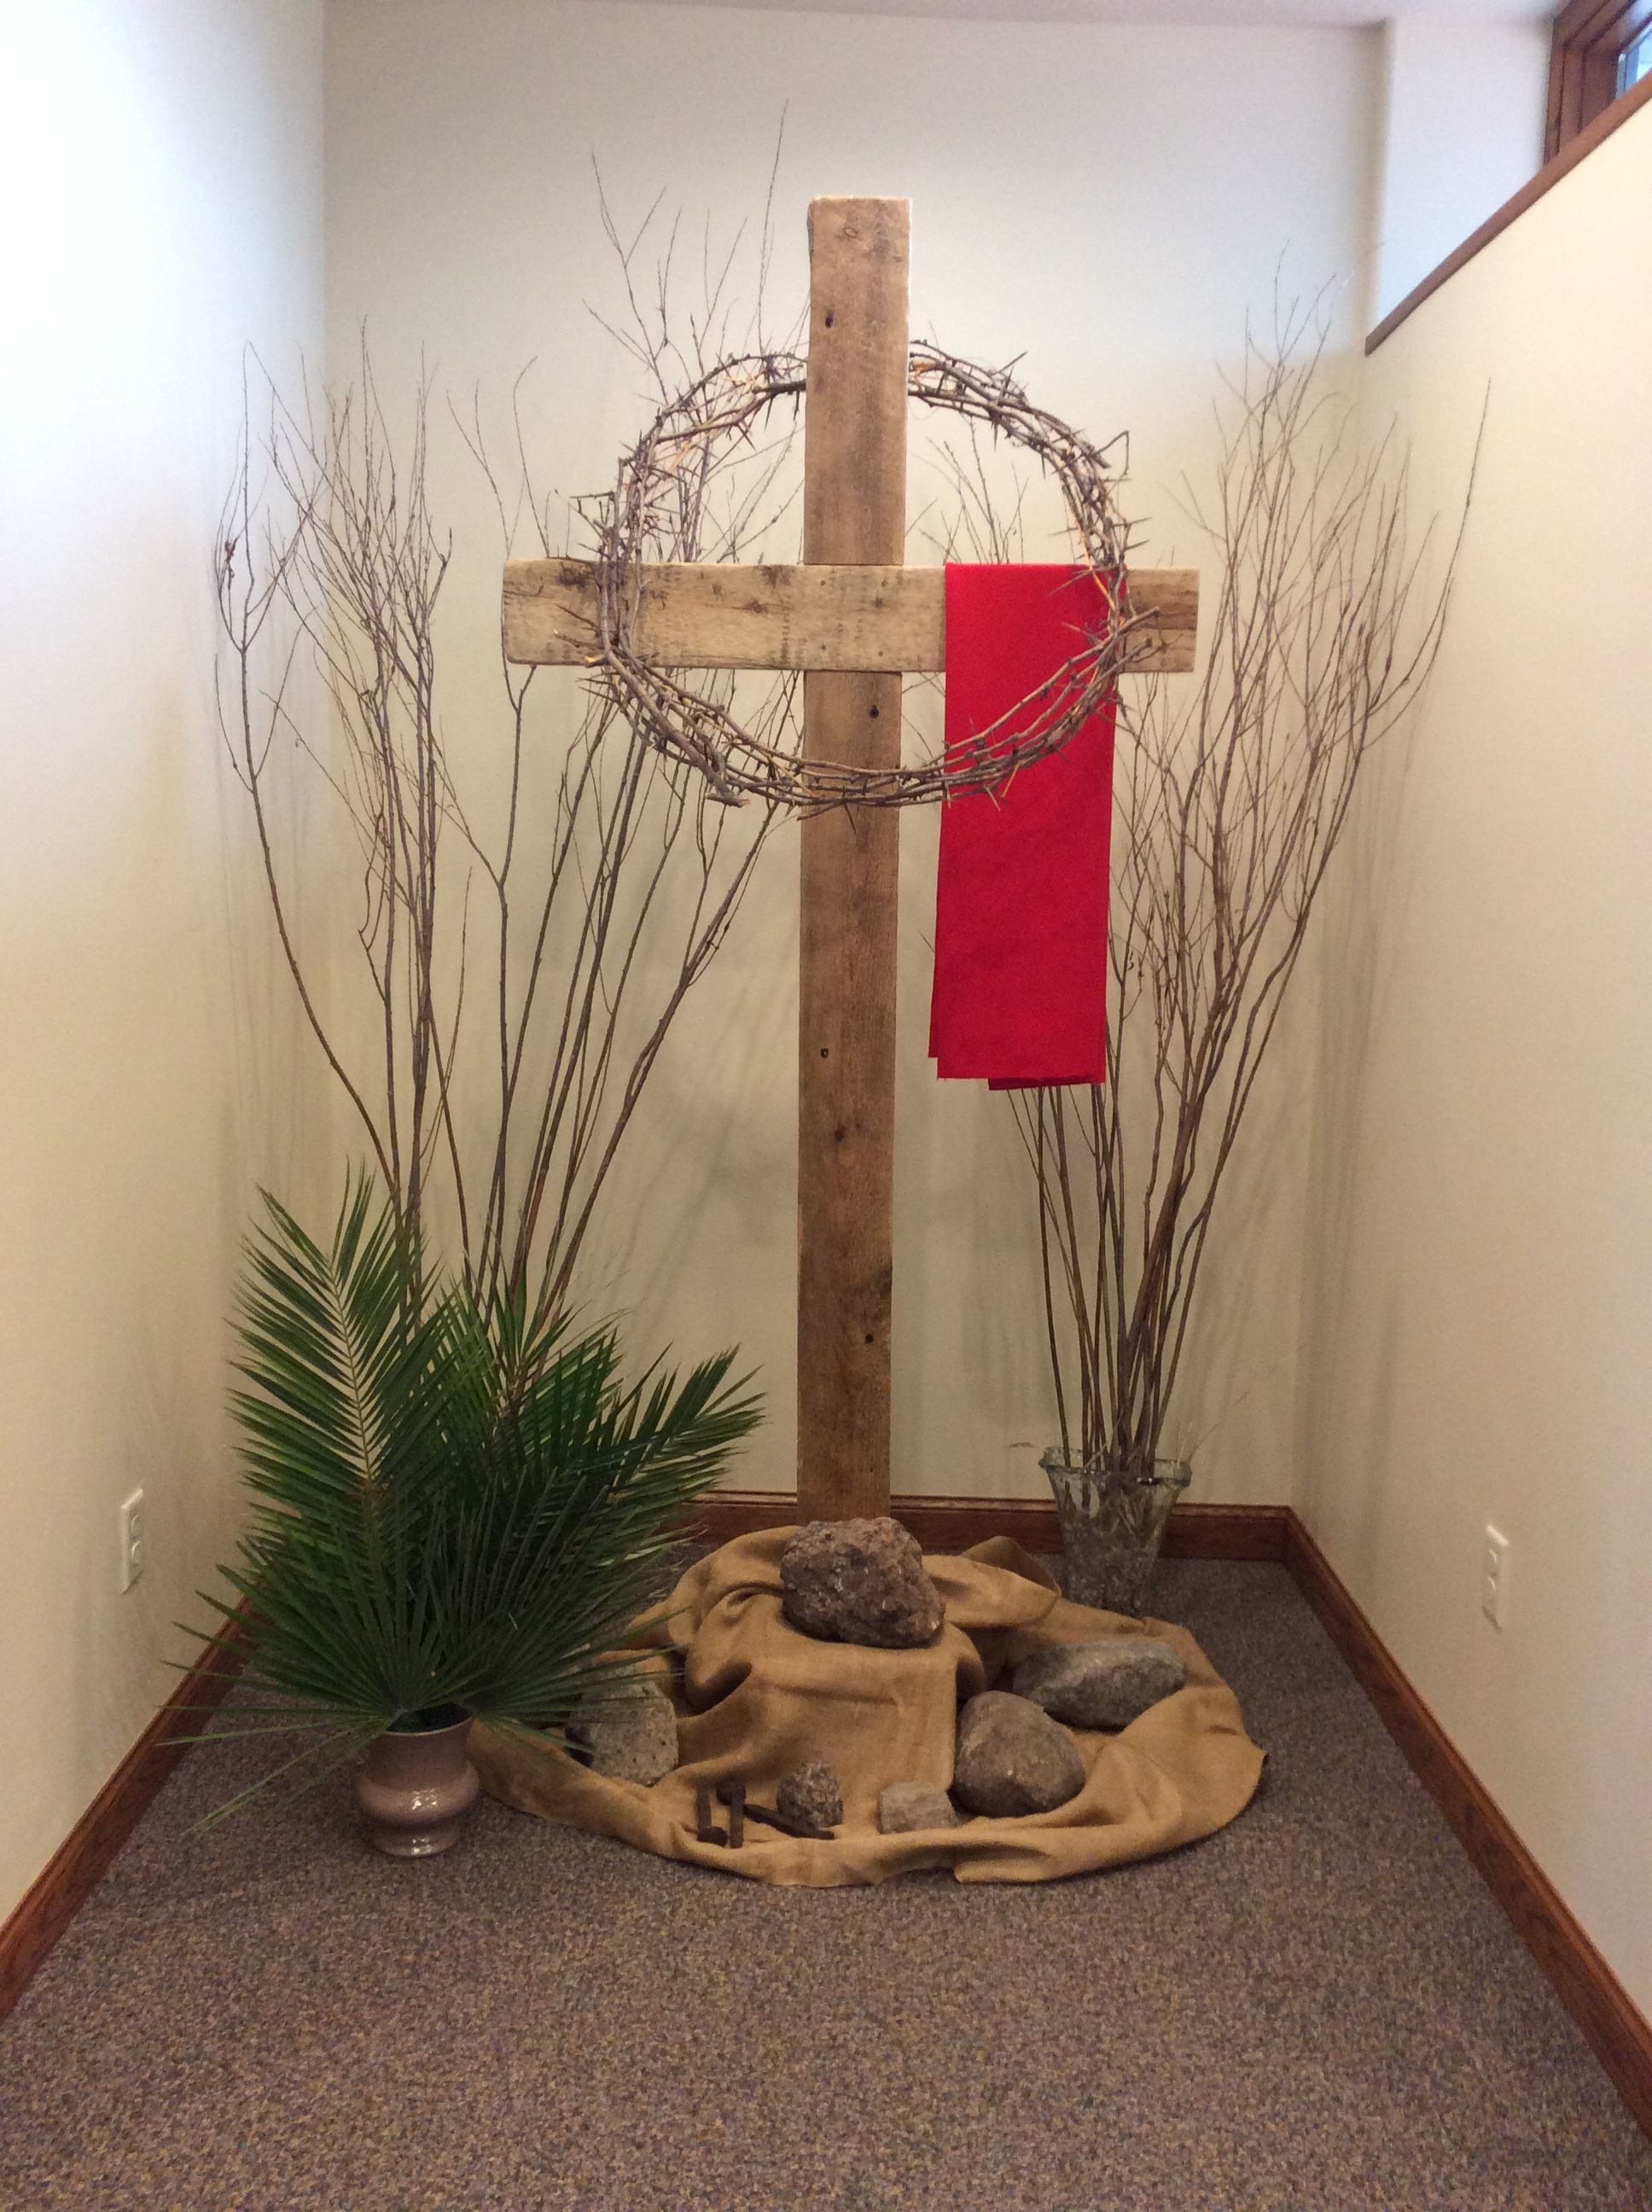 Good Friday St Olaf Catholic Church Imagen Cruz Decoracao De